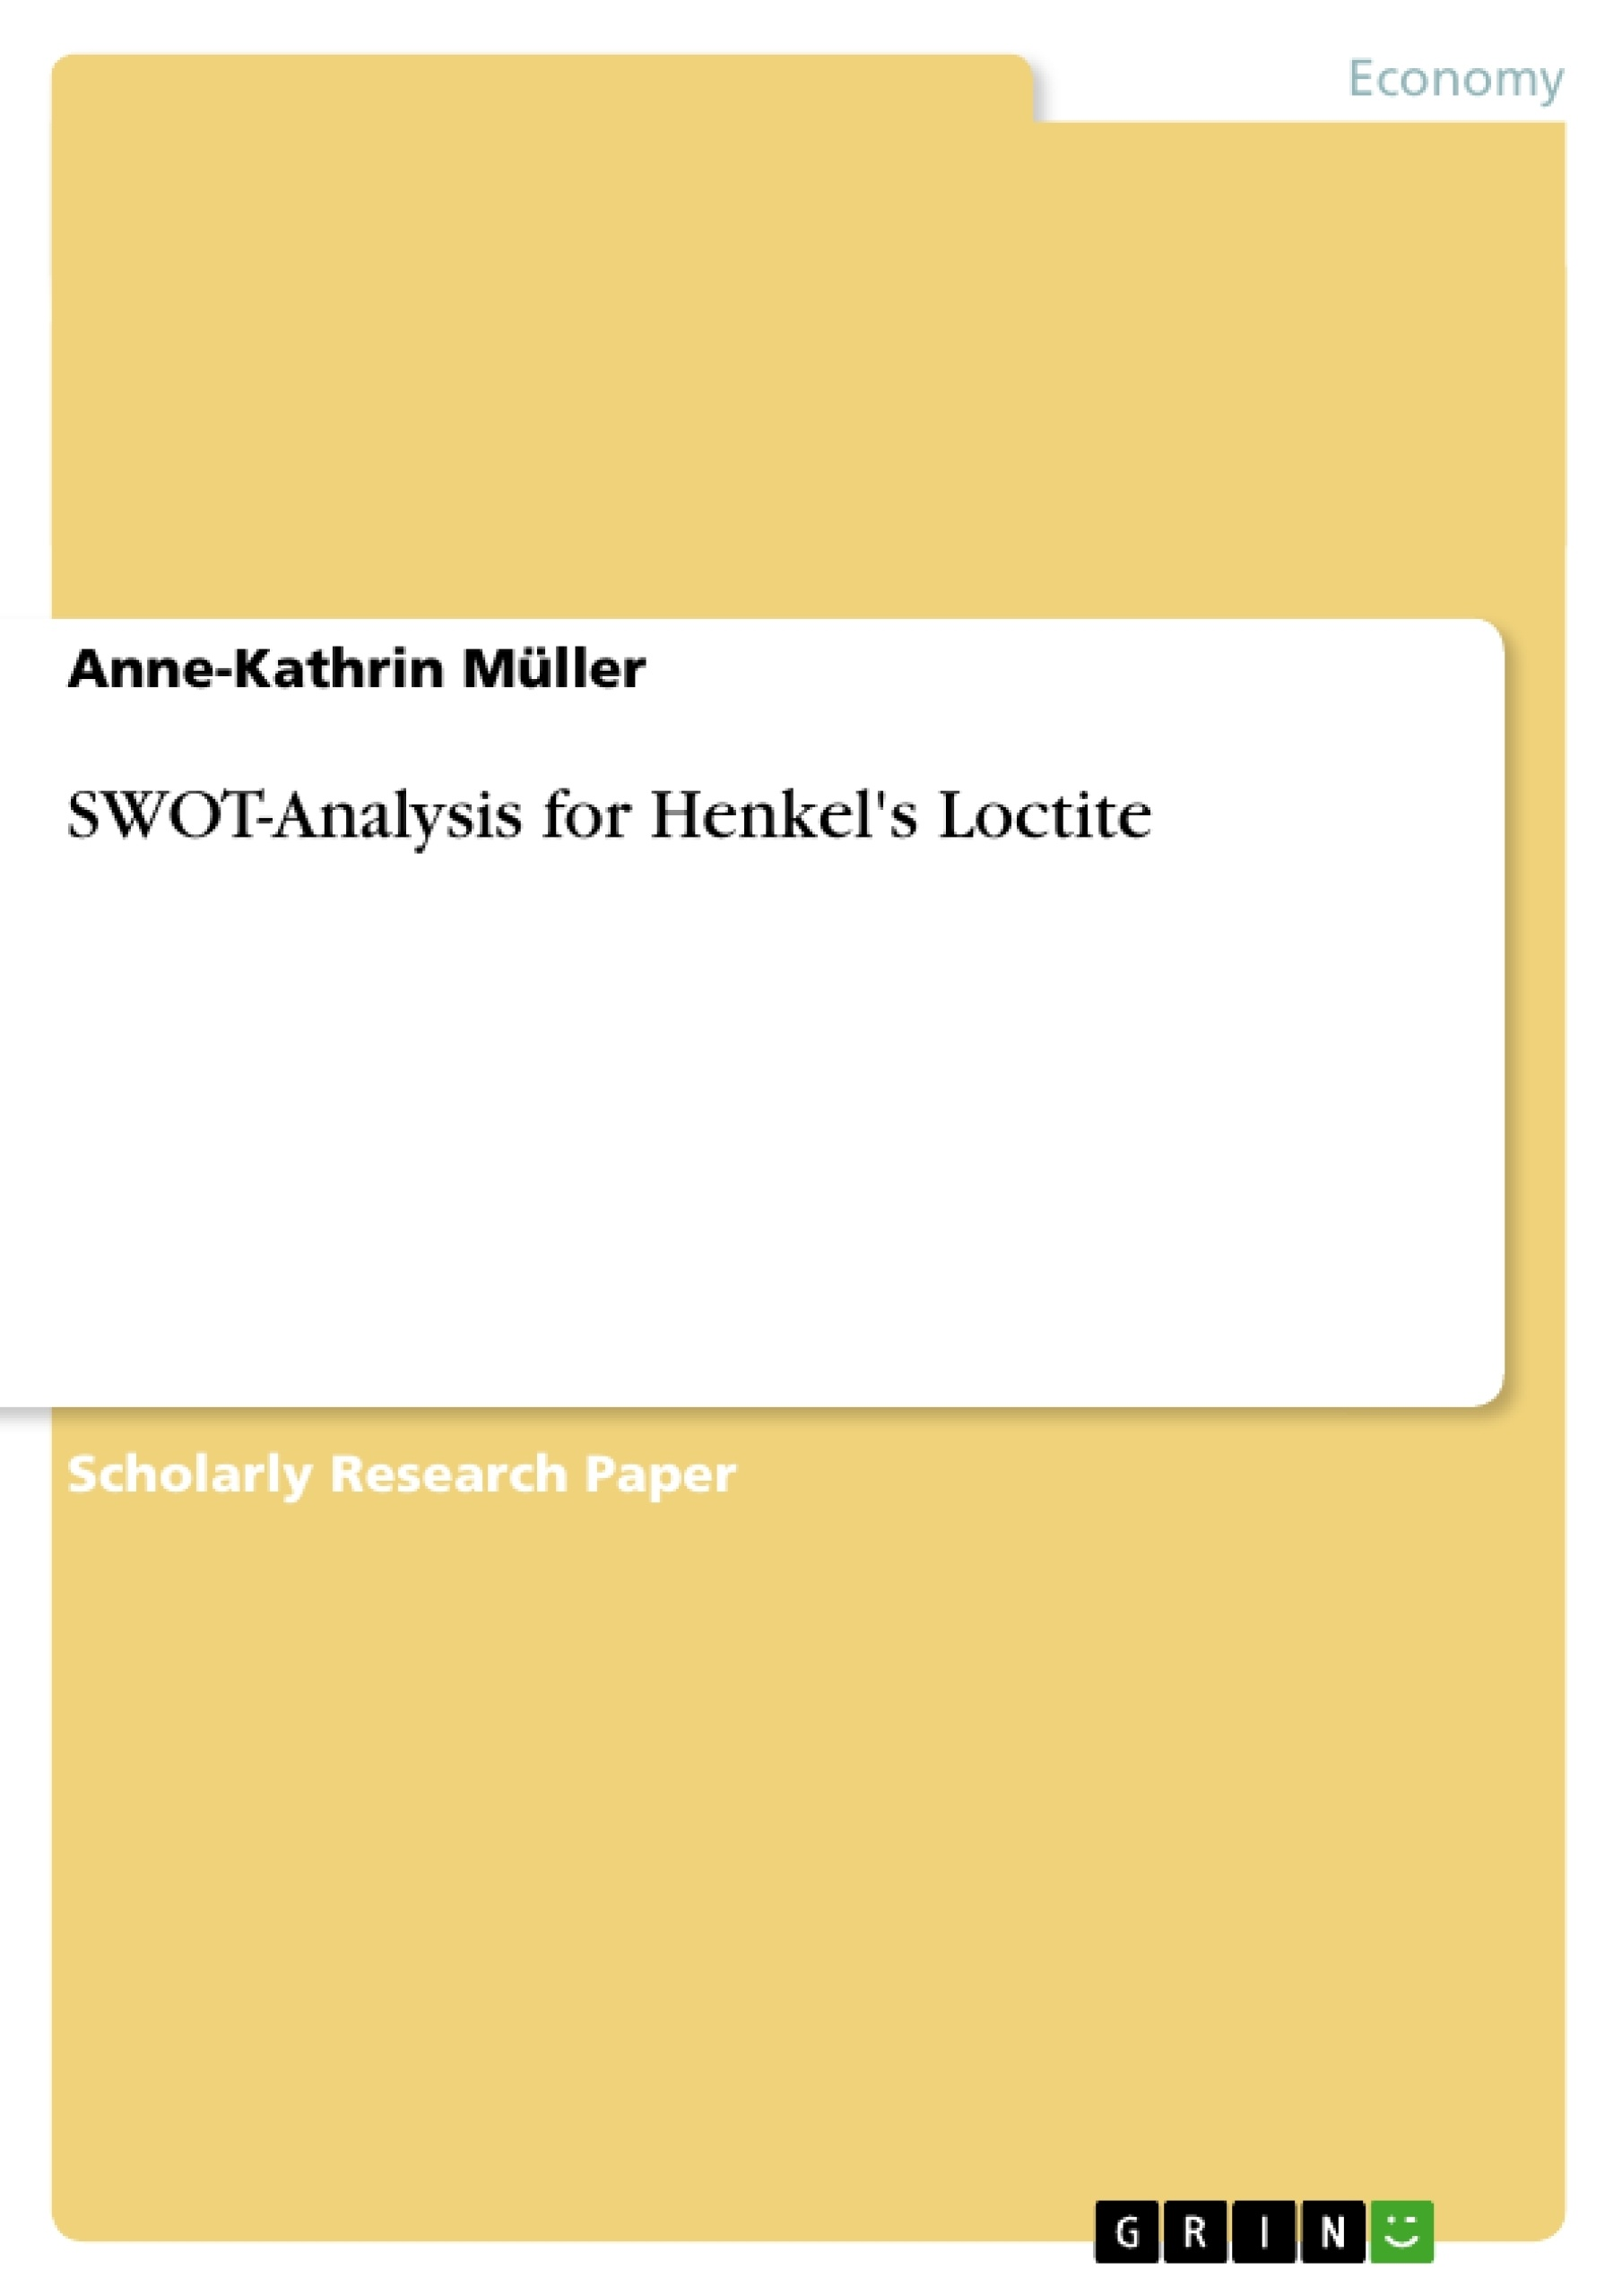 Henkel Group SWOT Analysis